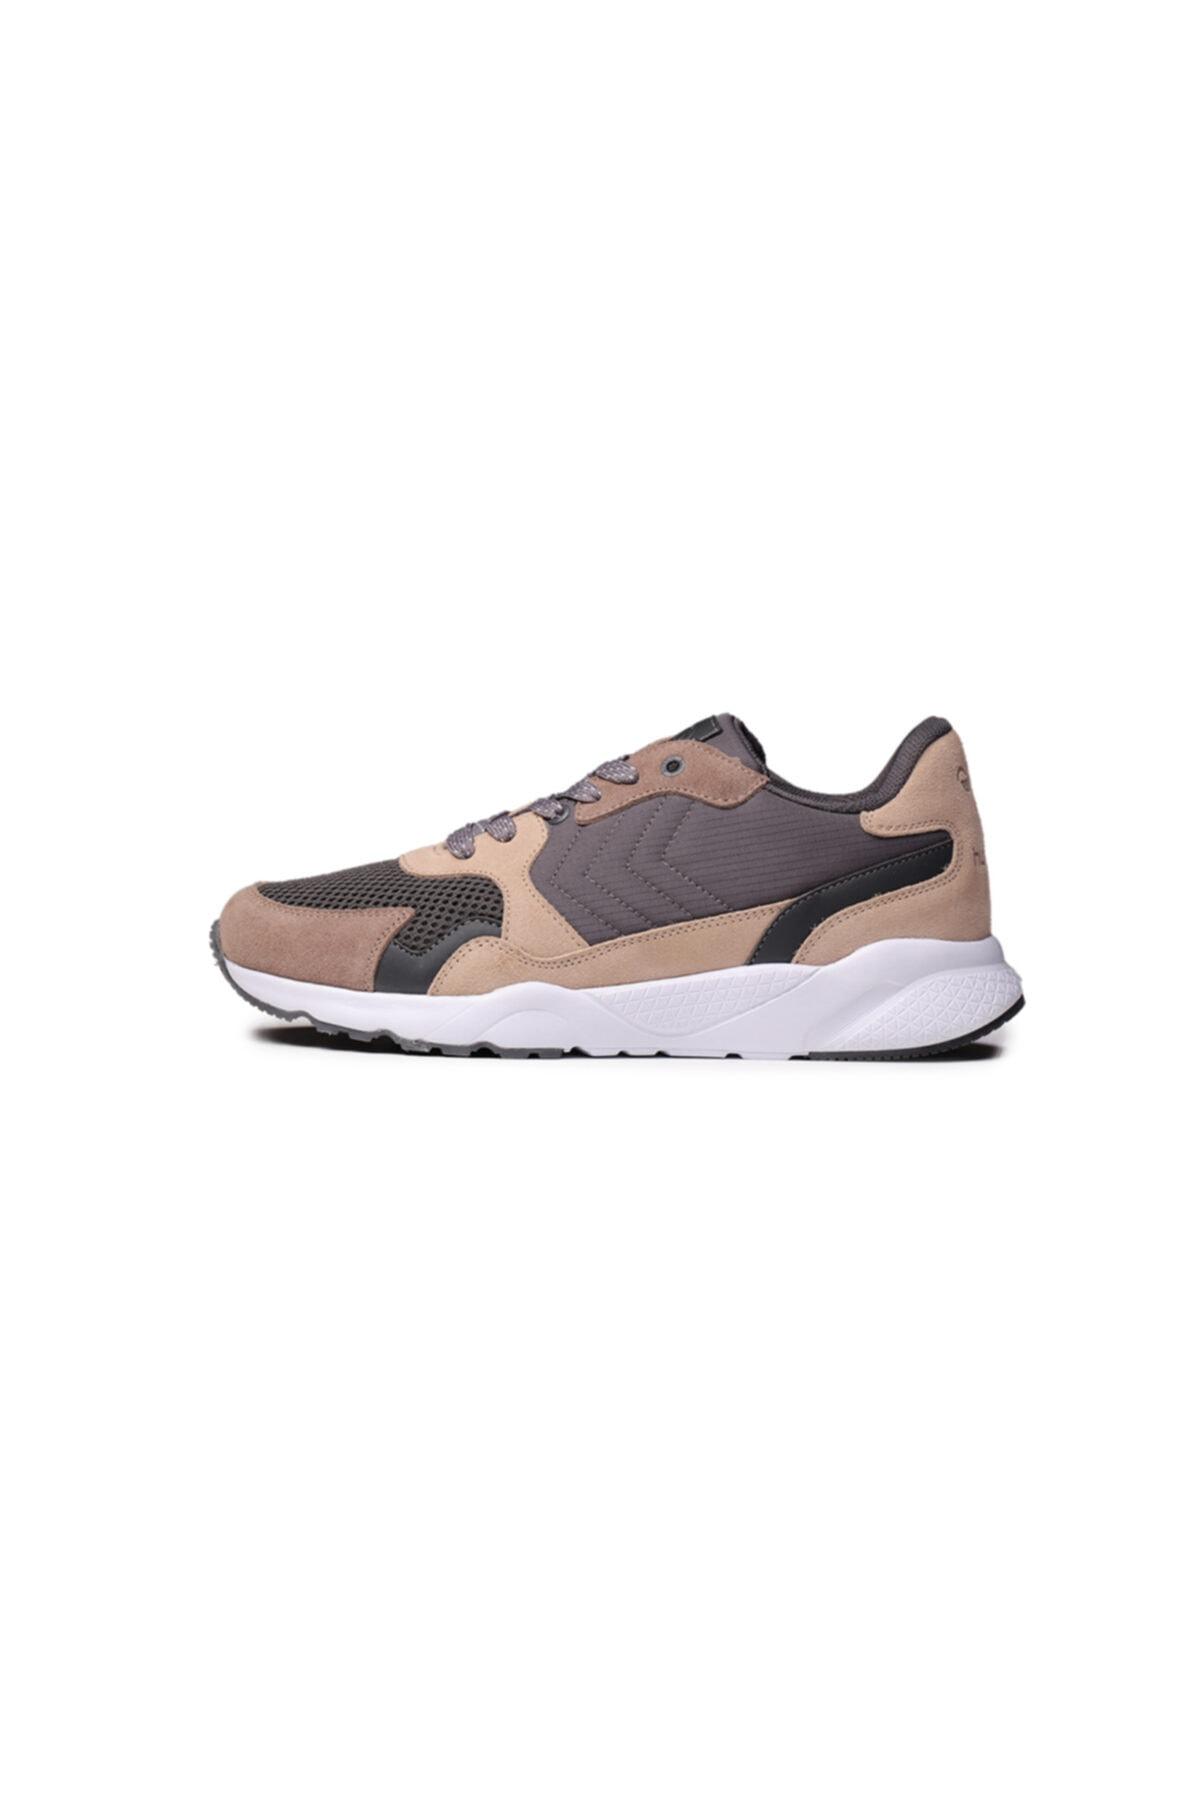 HUMMEL Norma Lıfestyle Shoes 2